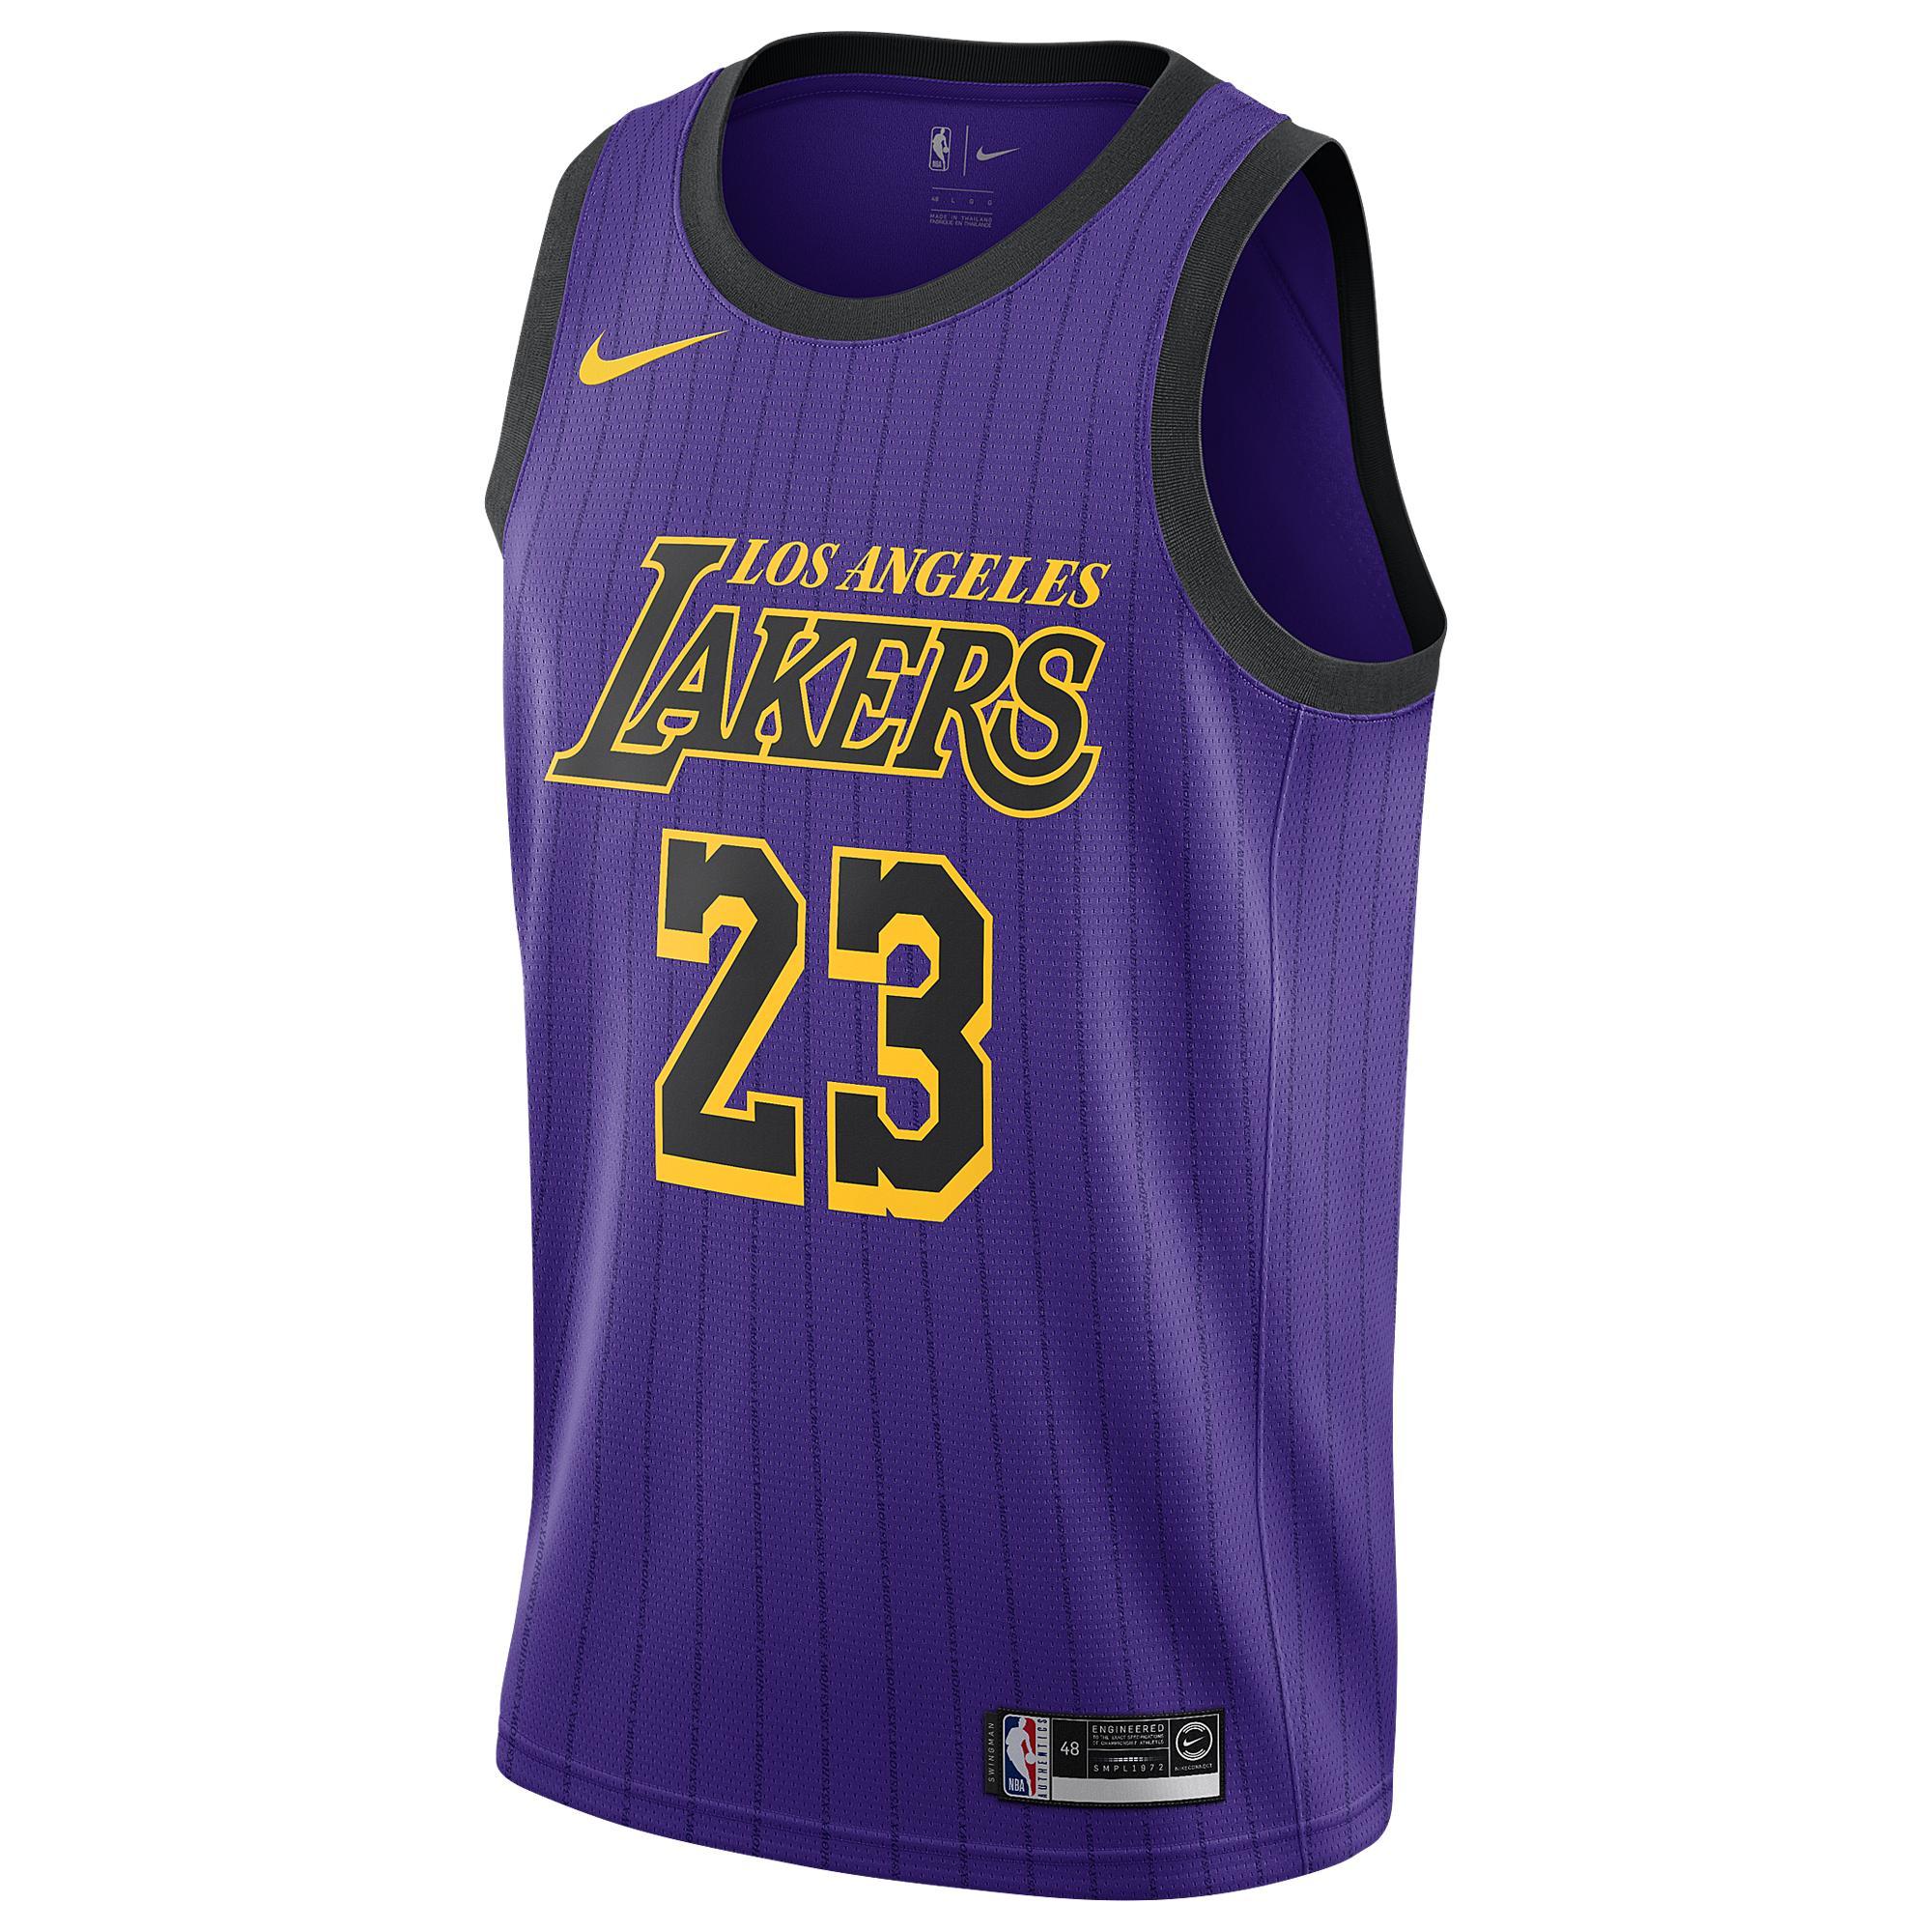 Lebron James Los Angeles Lakers City Swingman Jersey 2018